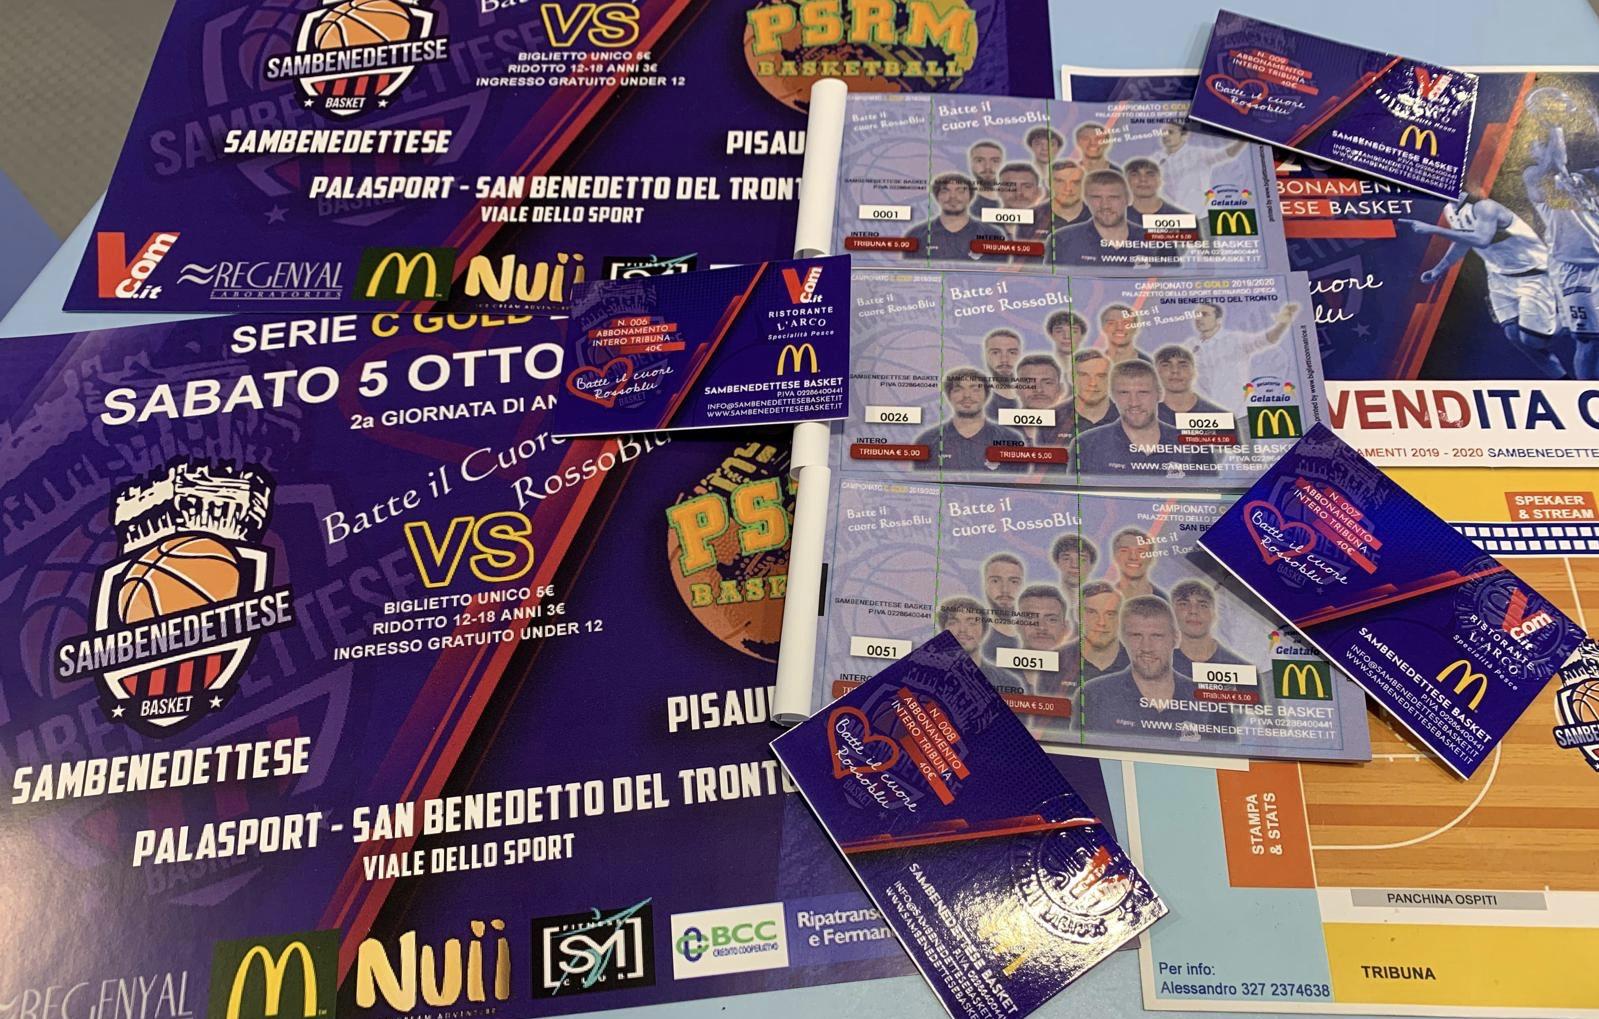 Biglietti